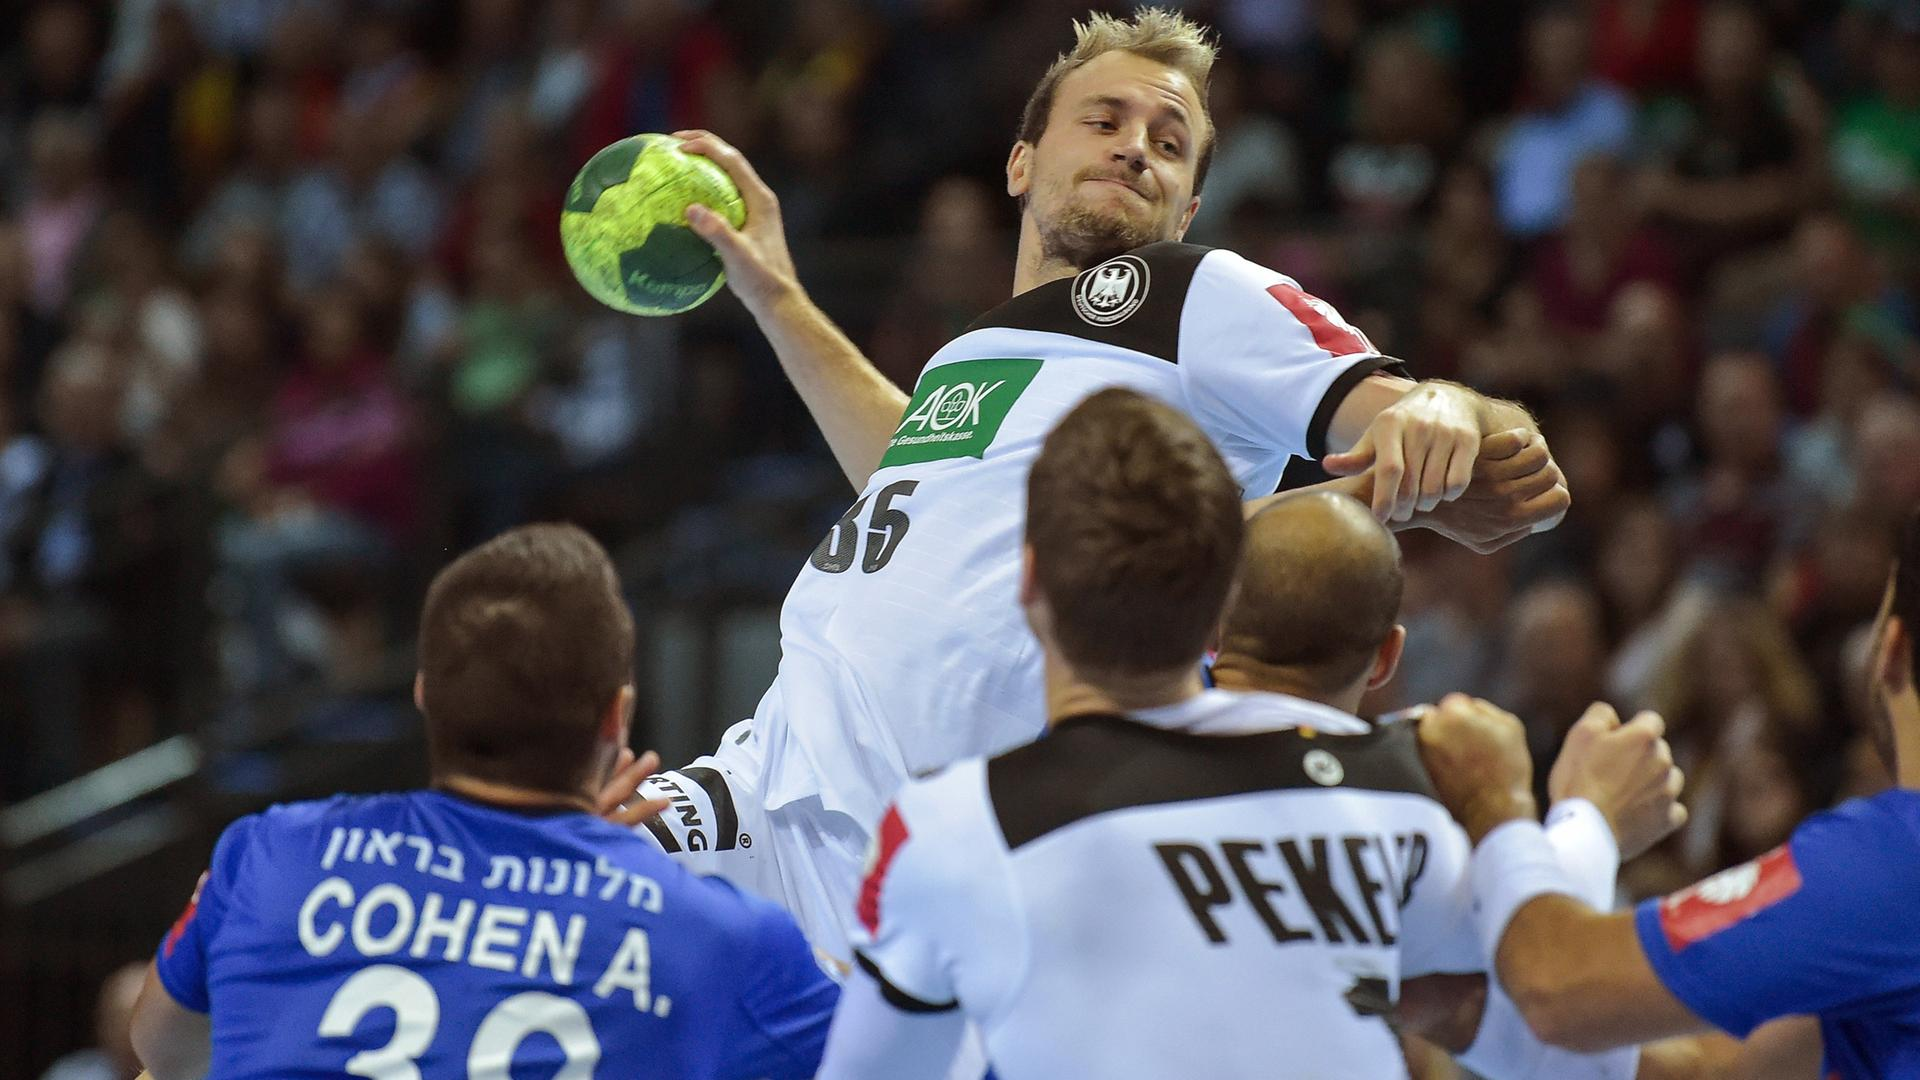 Handball Em Qualifikation Deutschland Israel Am 2410 Zdfmediathek